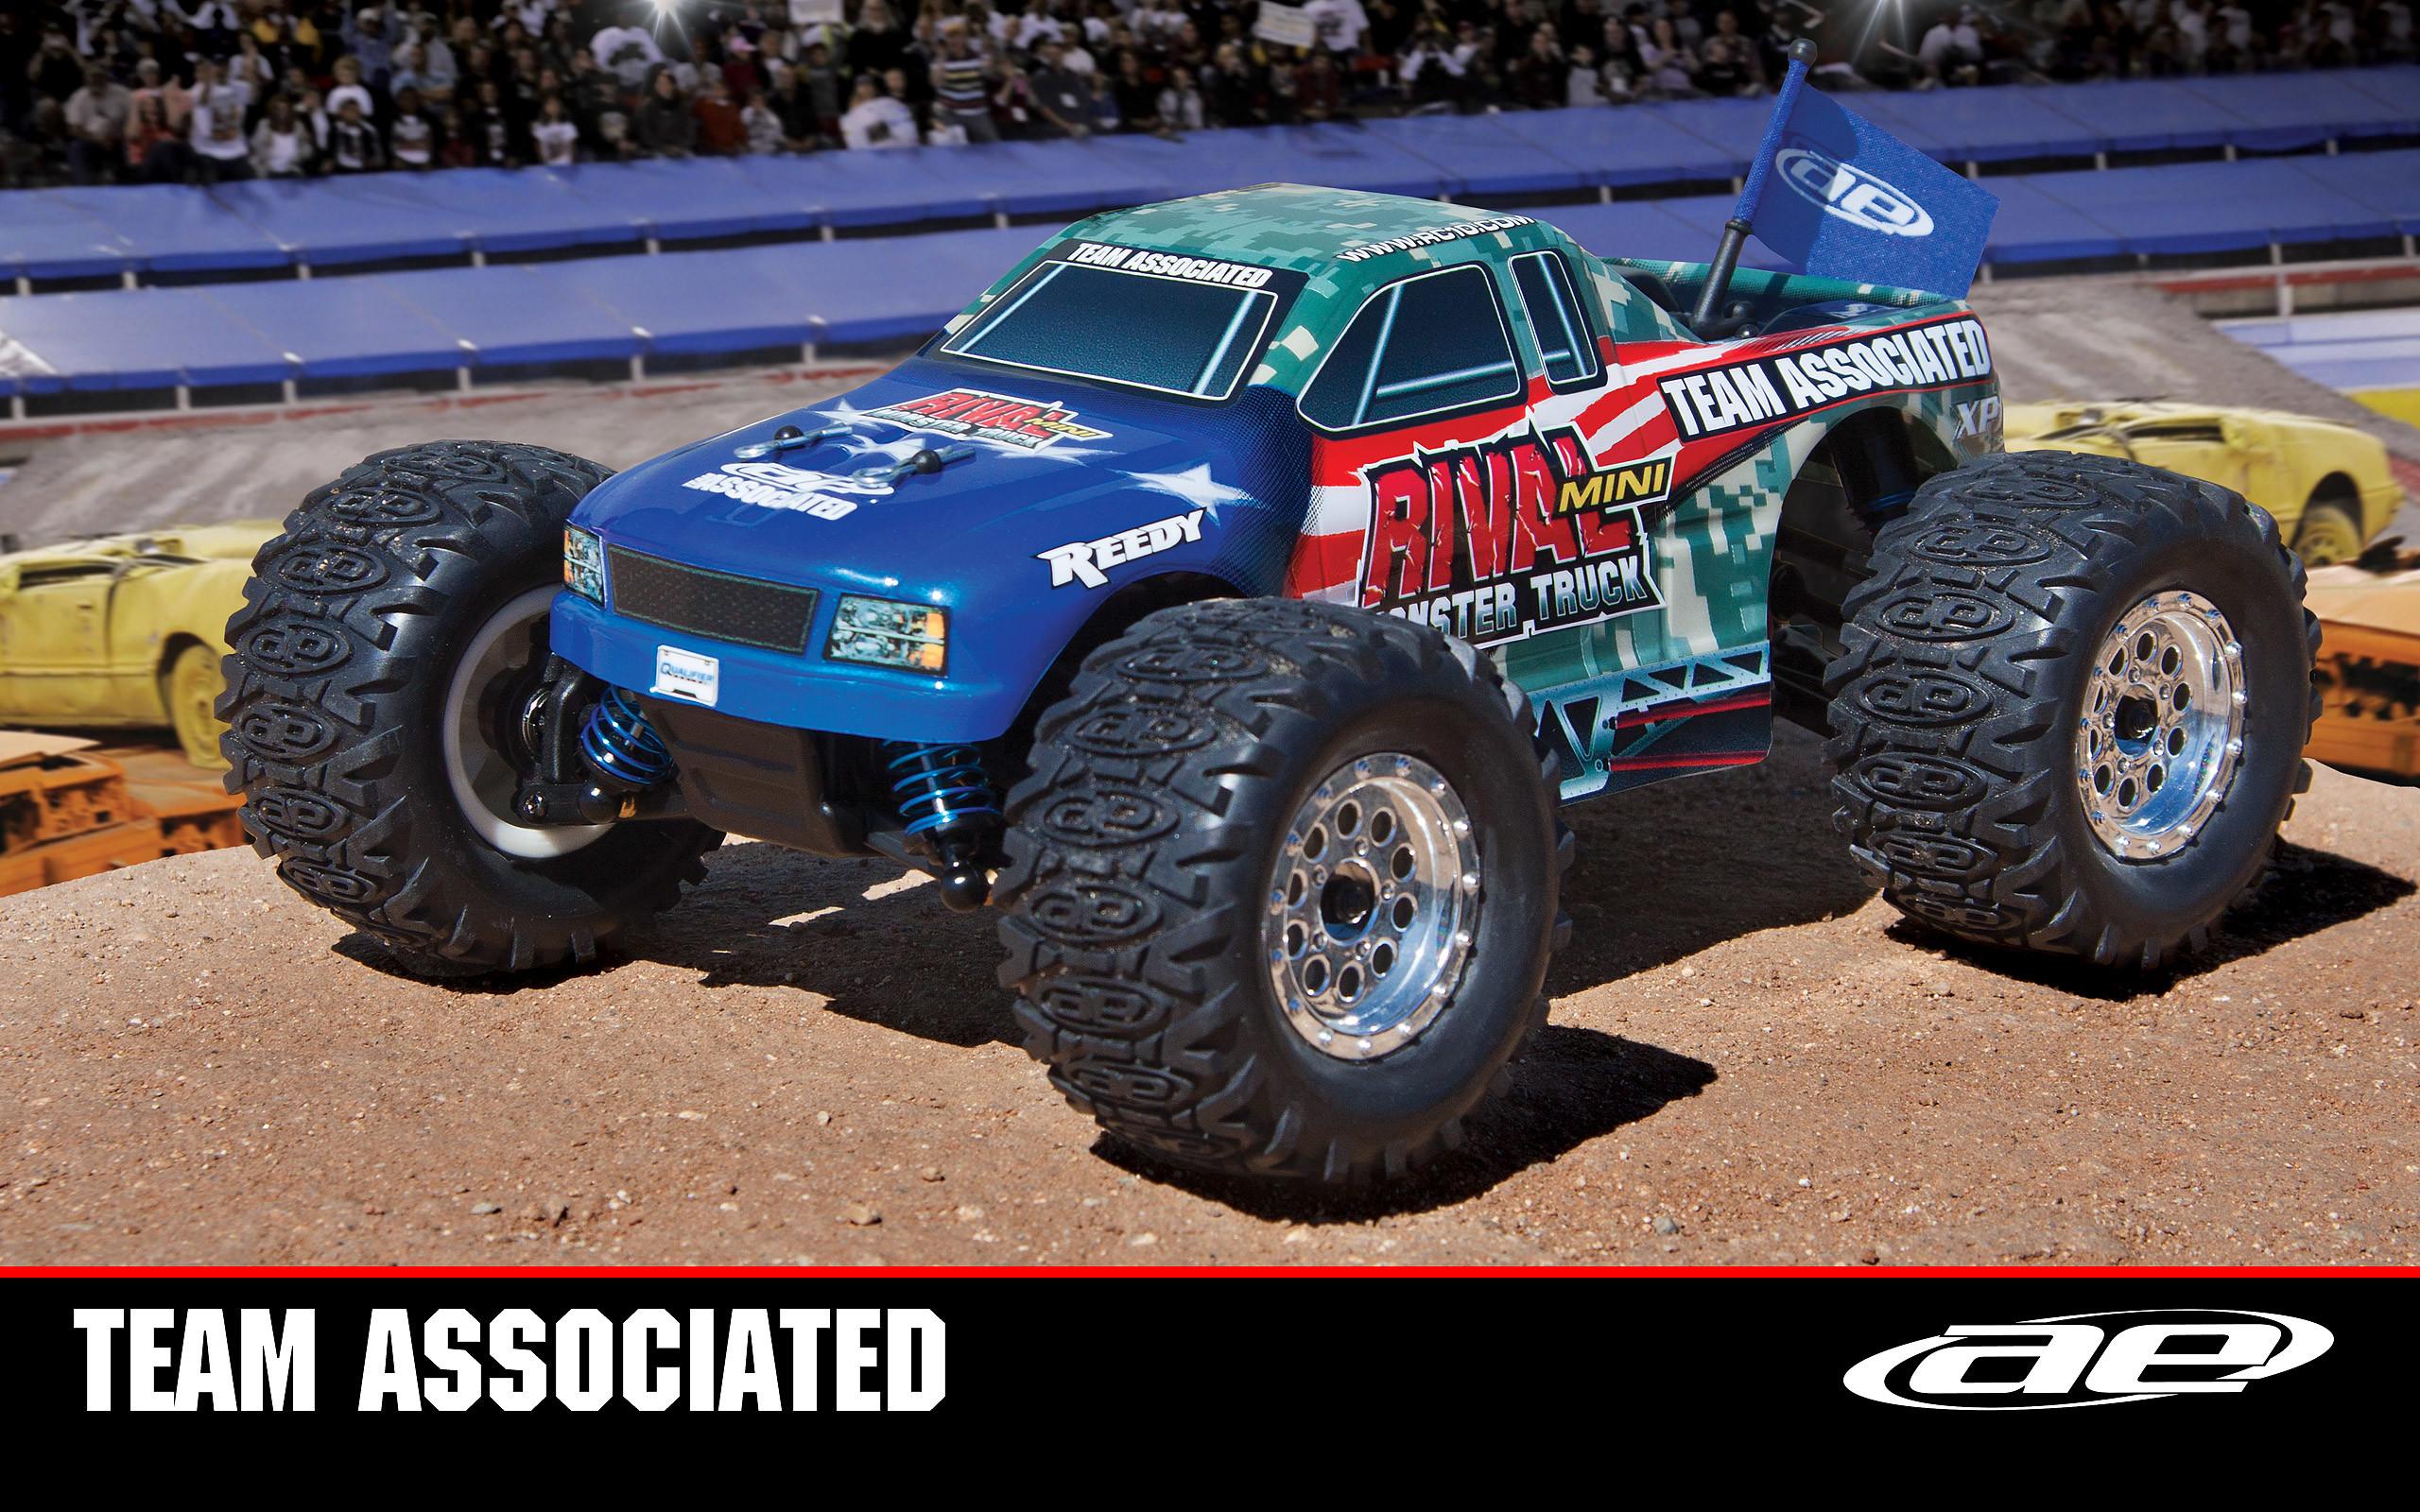 Res: 2560x1600, Rival Mini Monster Truck